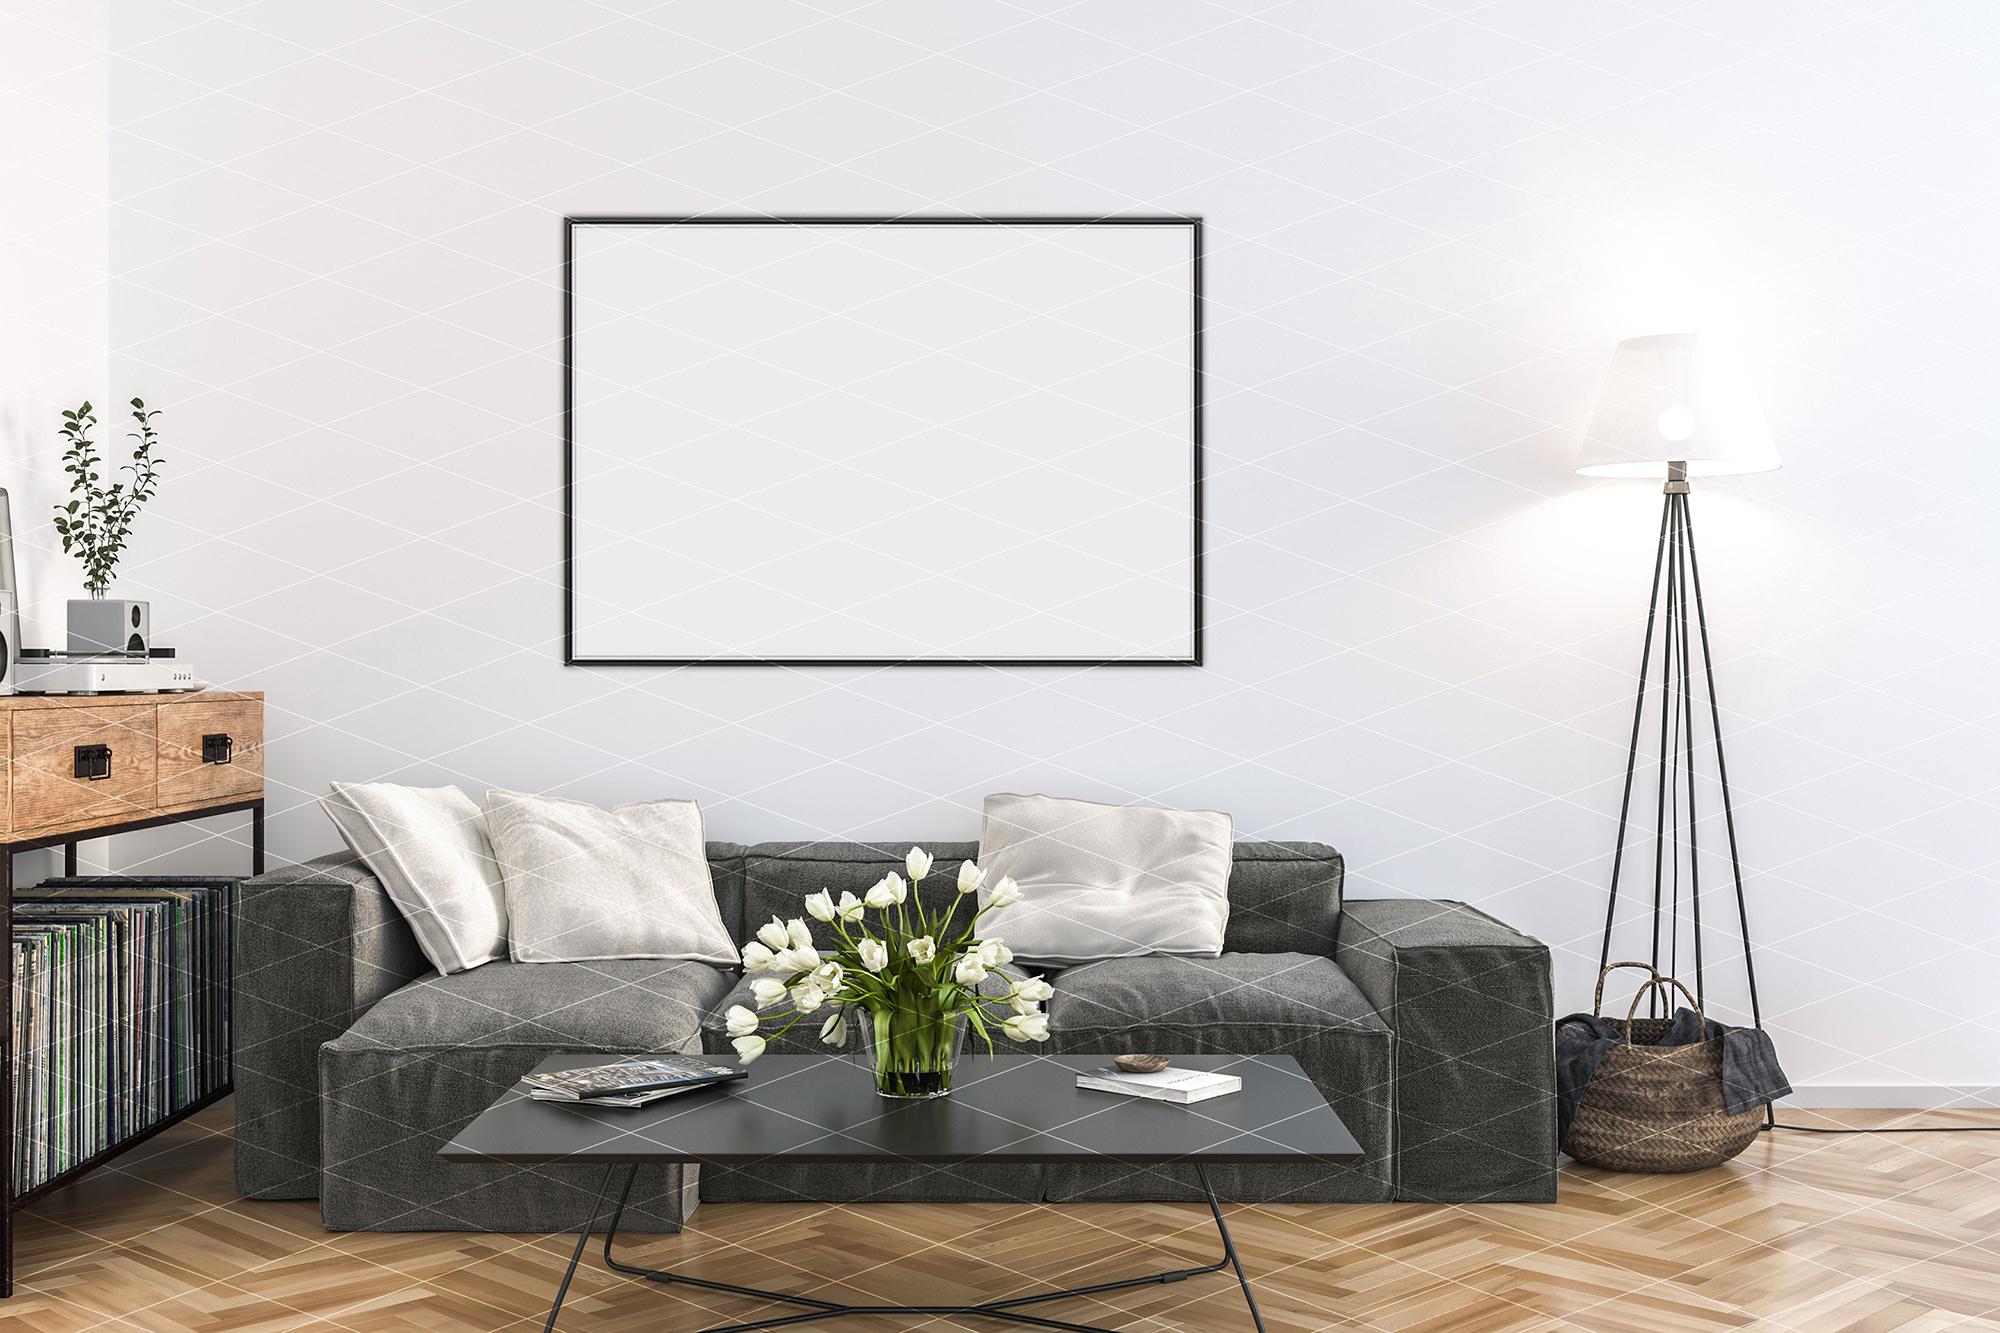 Interior mockup - artwork background - kitchen example image 3